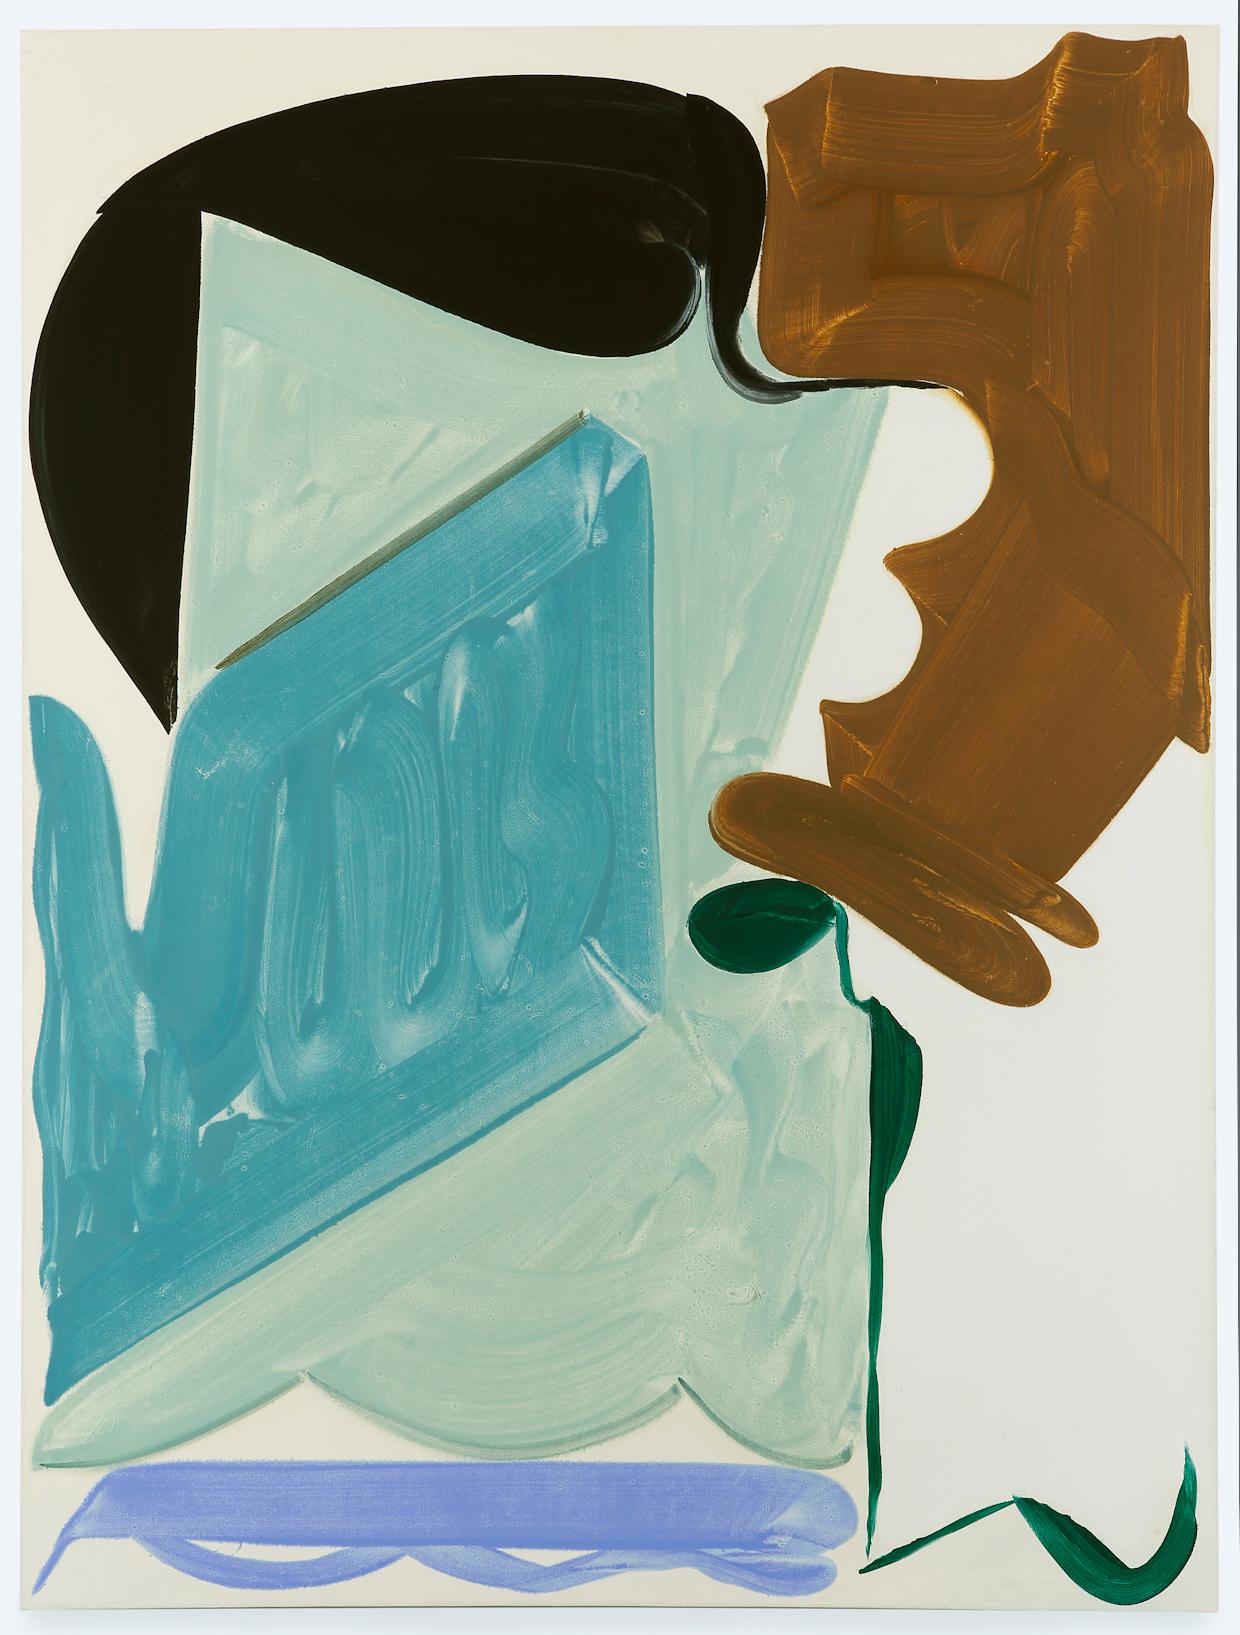 Patricia Treib, Peacock, 2016, oil on canvas, 66 x 50 inches